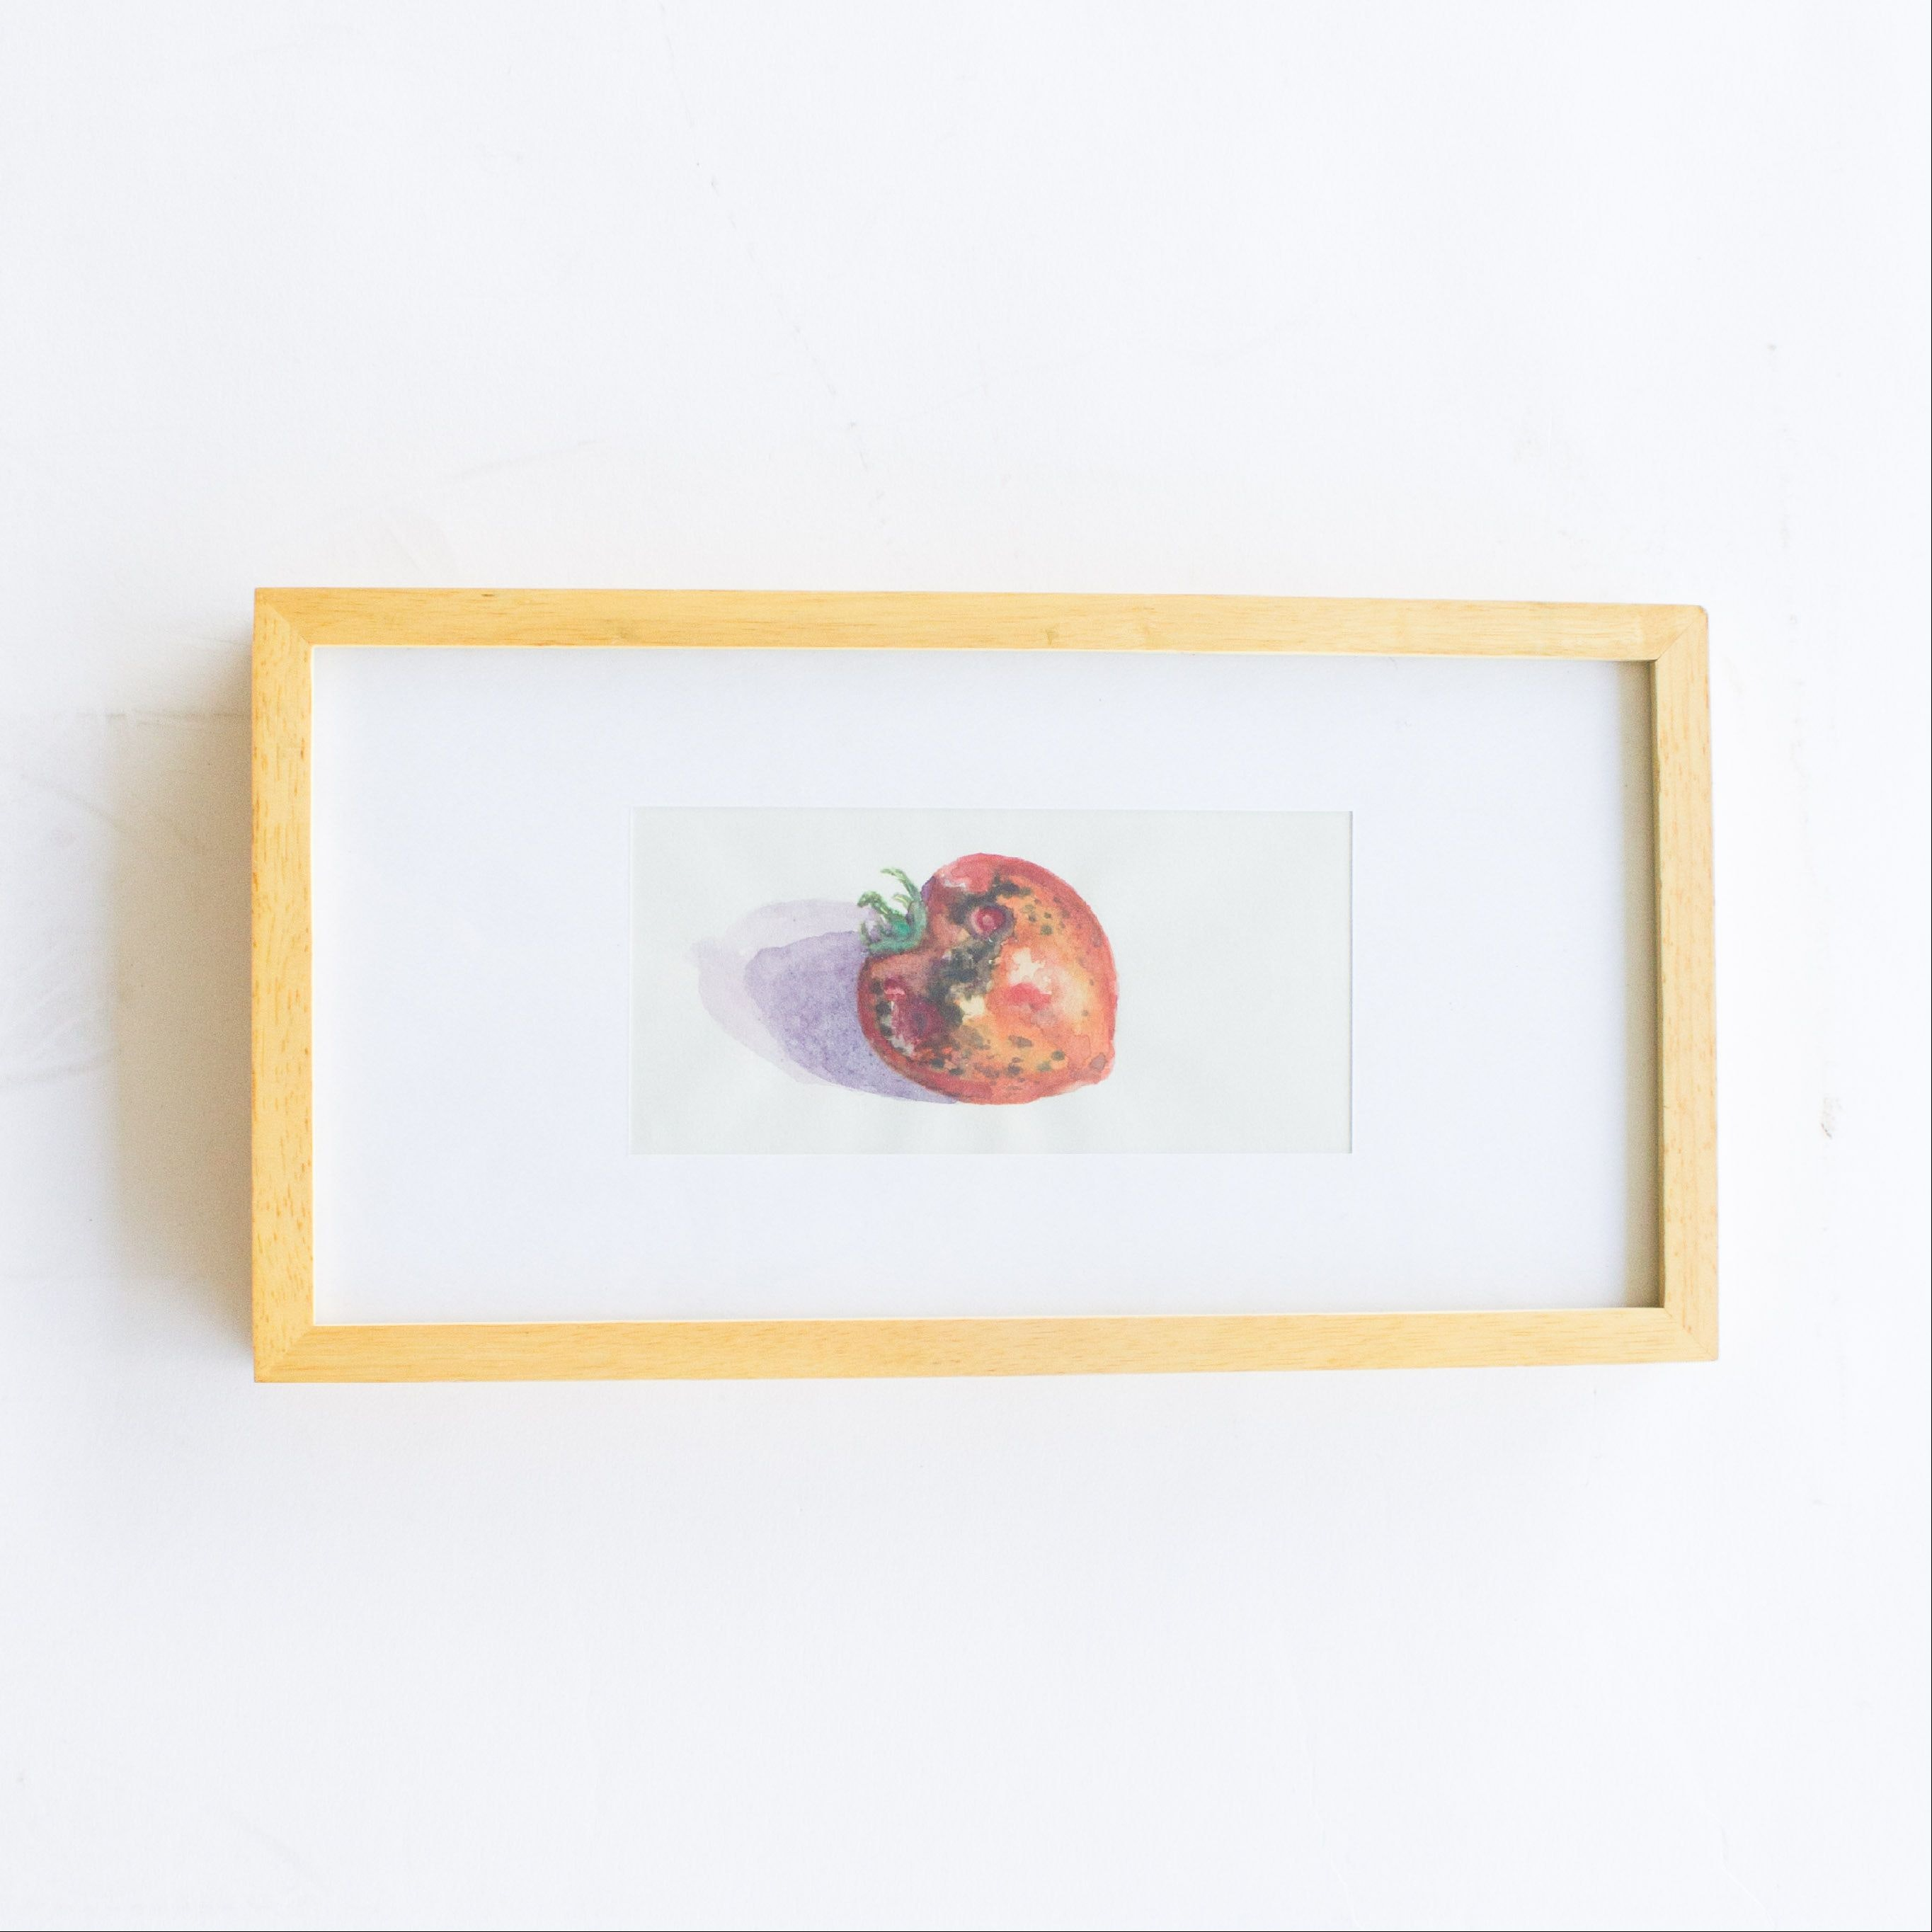 Joseph Gargasz Watercolor of a Strawberry